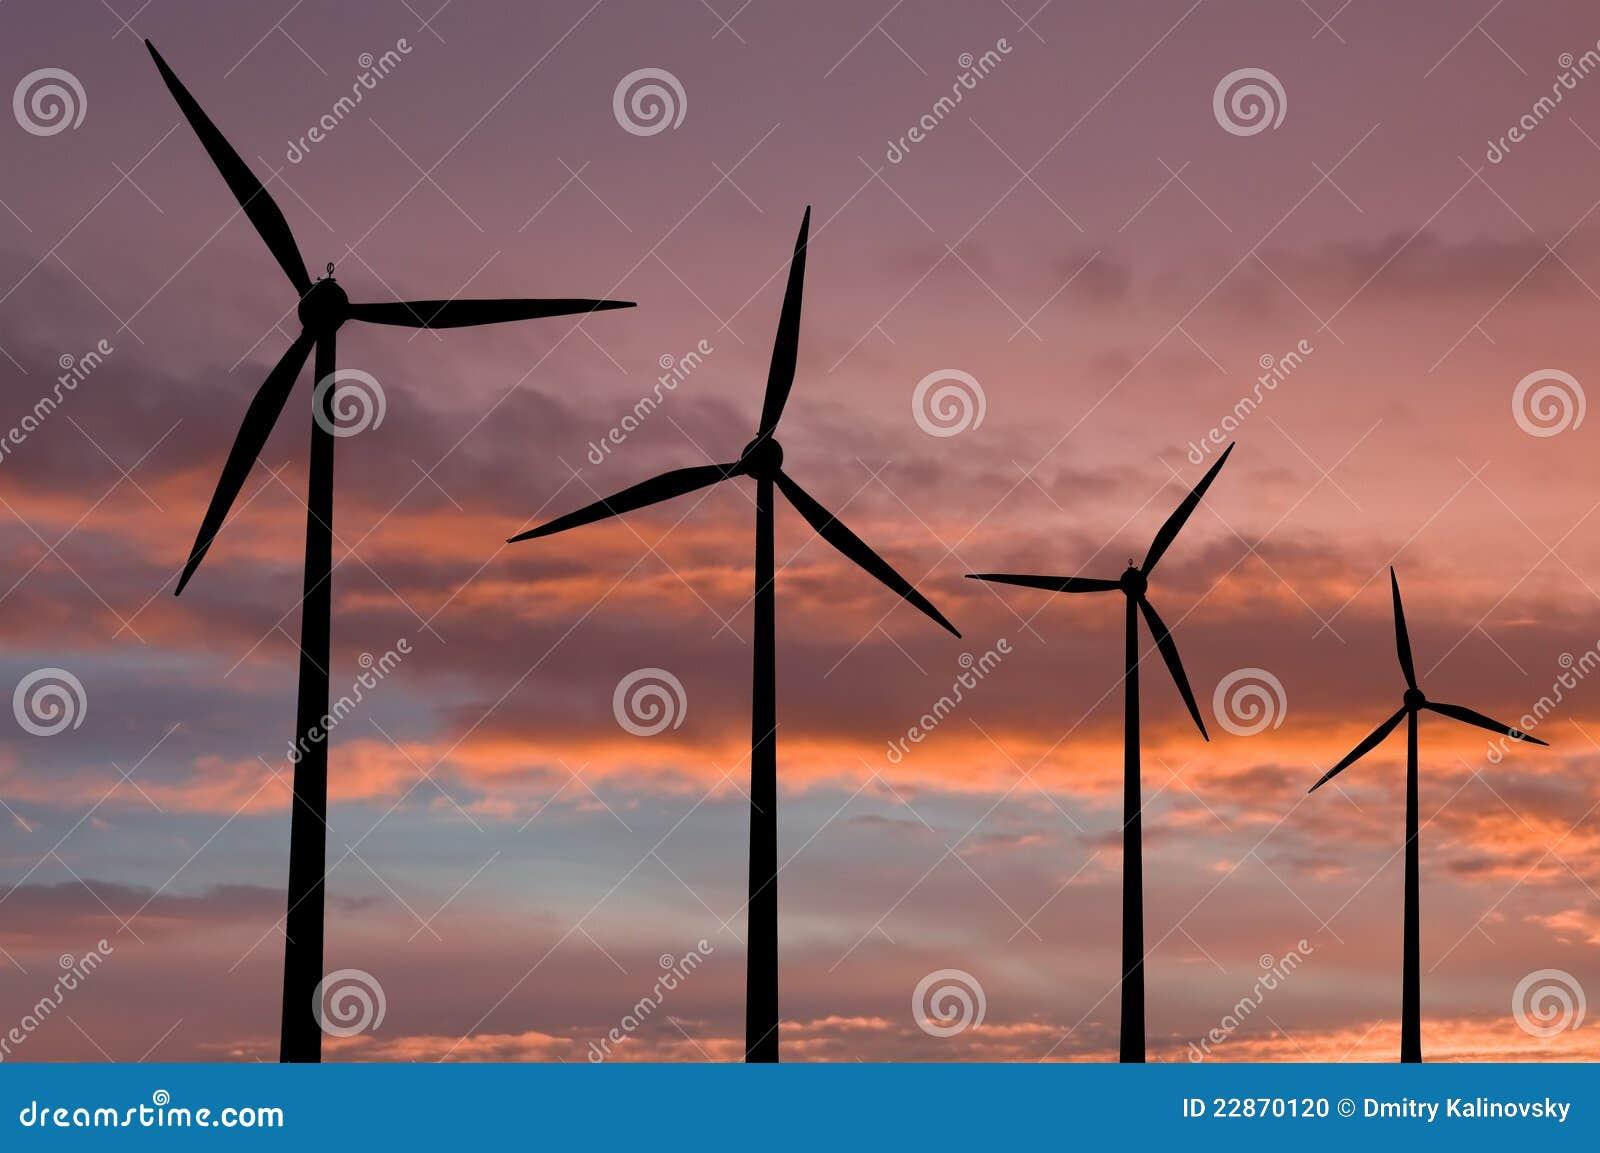 Ecology energy farm with wind turbine